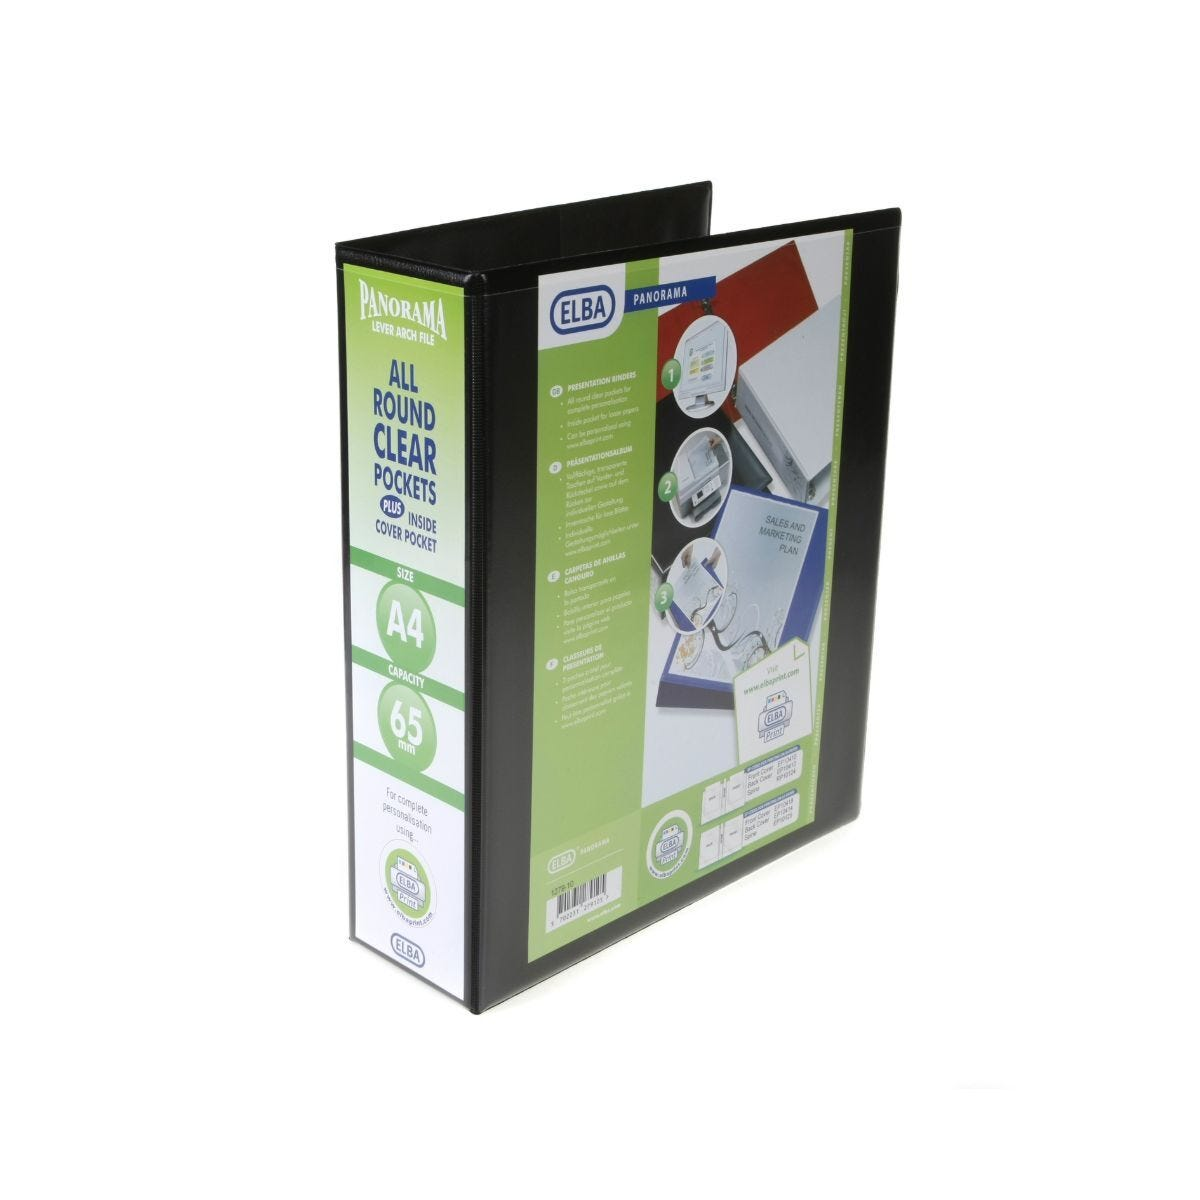 Elba Presentation Lever Arch File A4 65mm Black